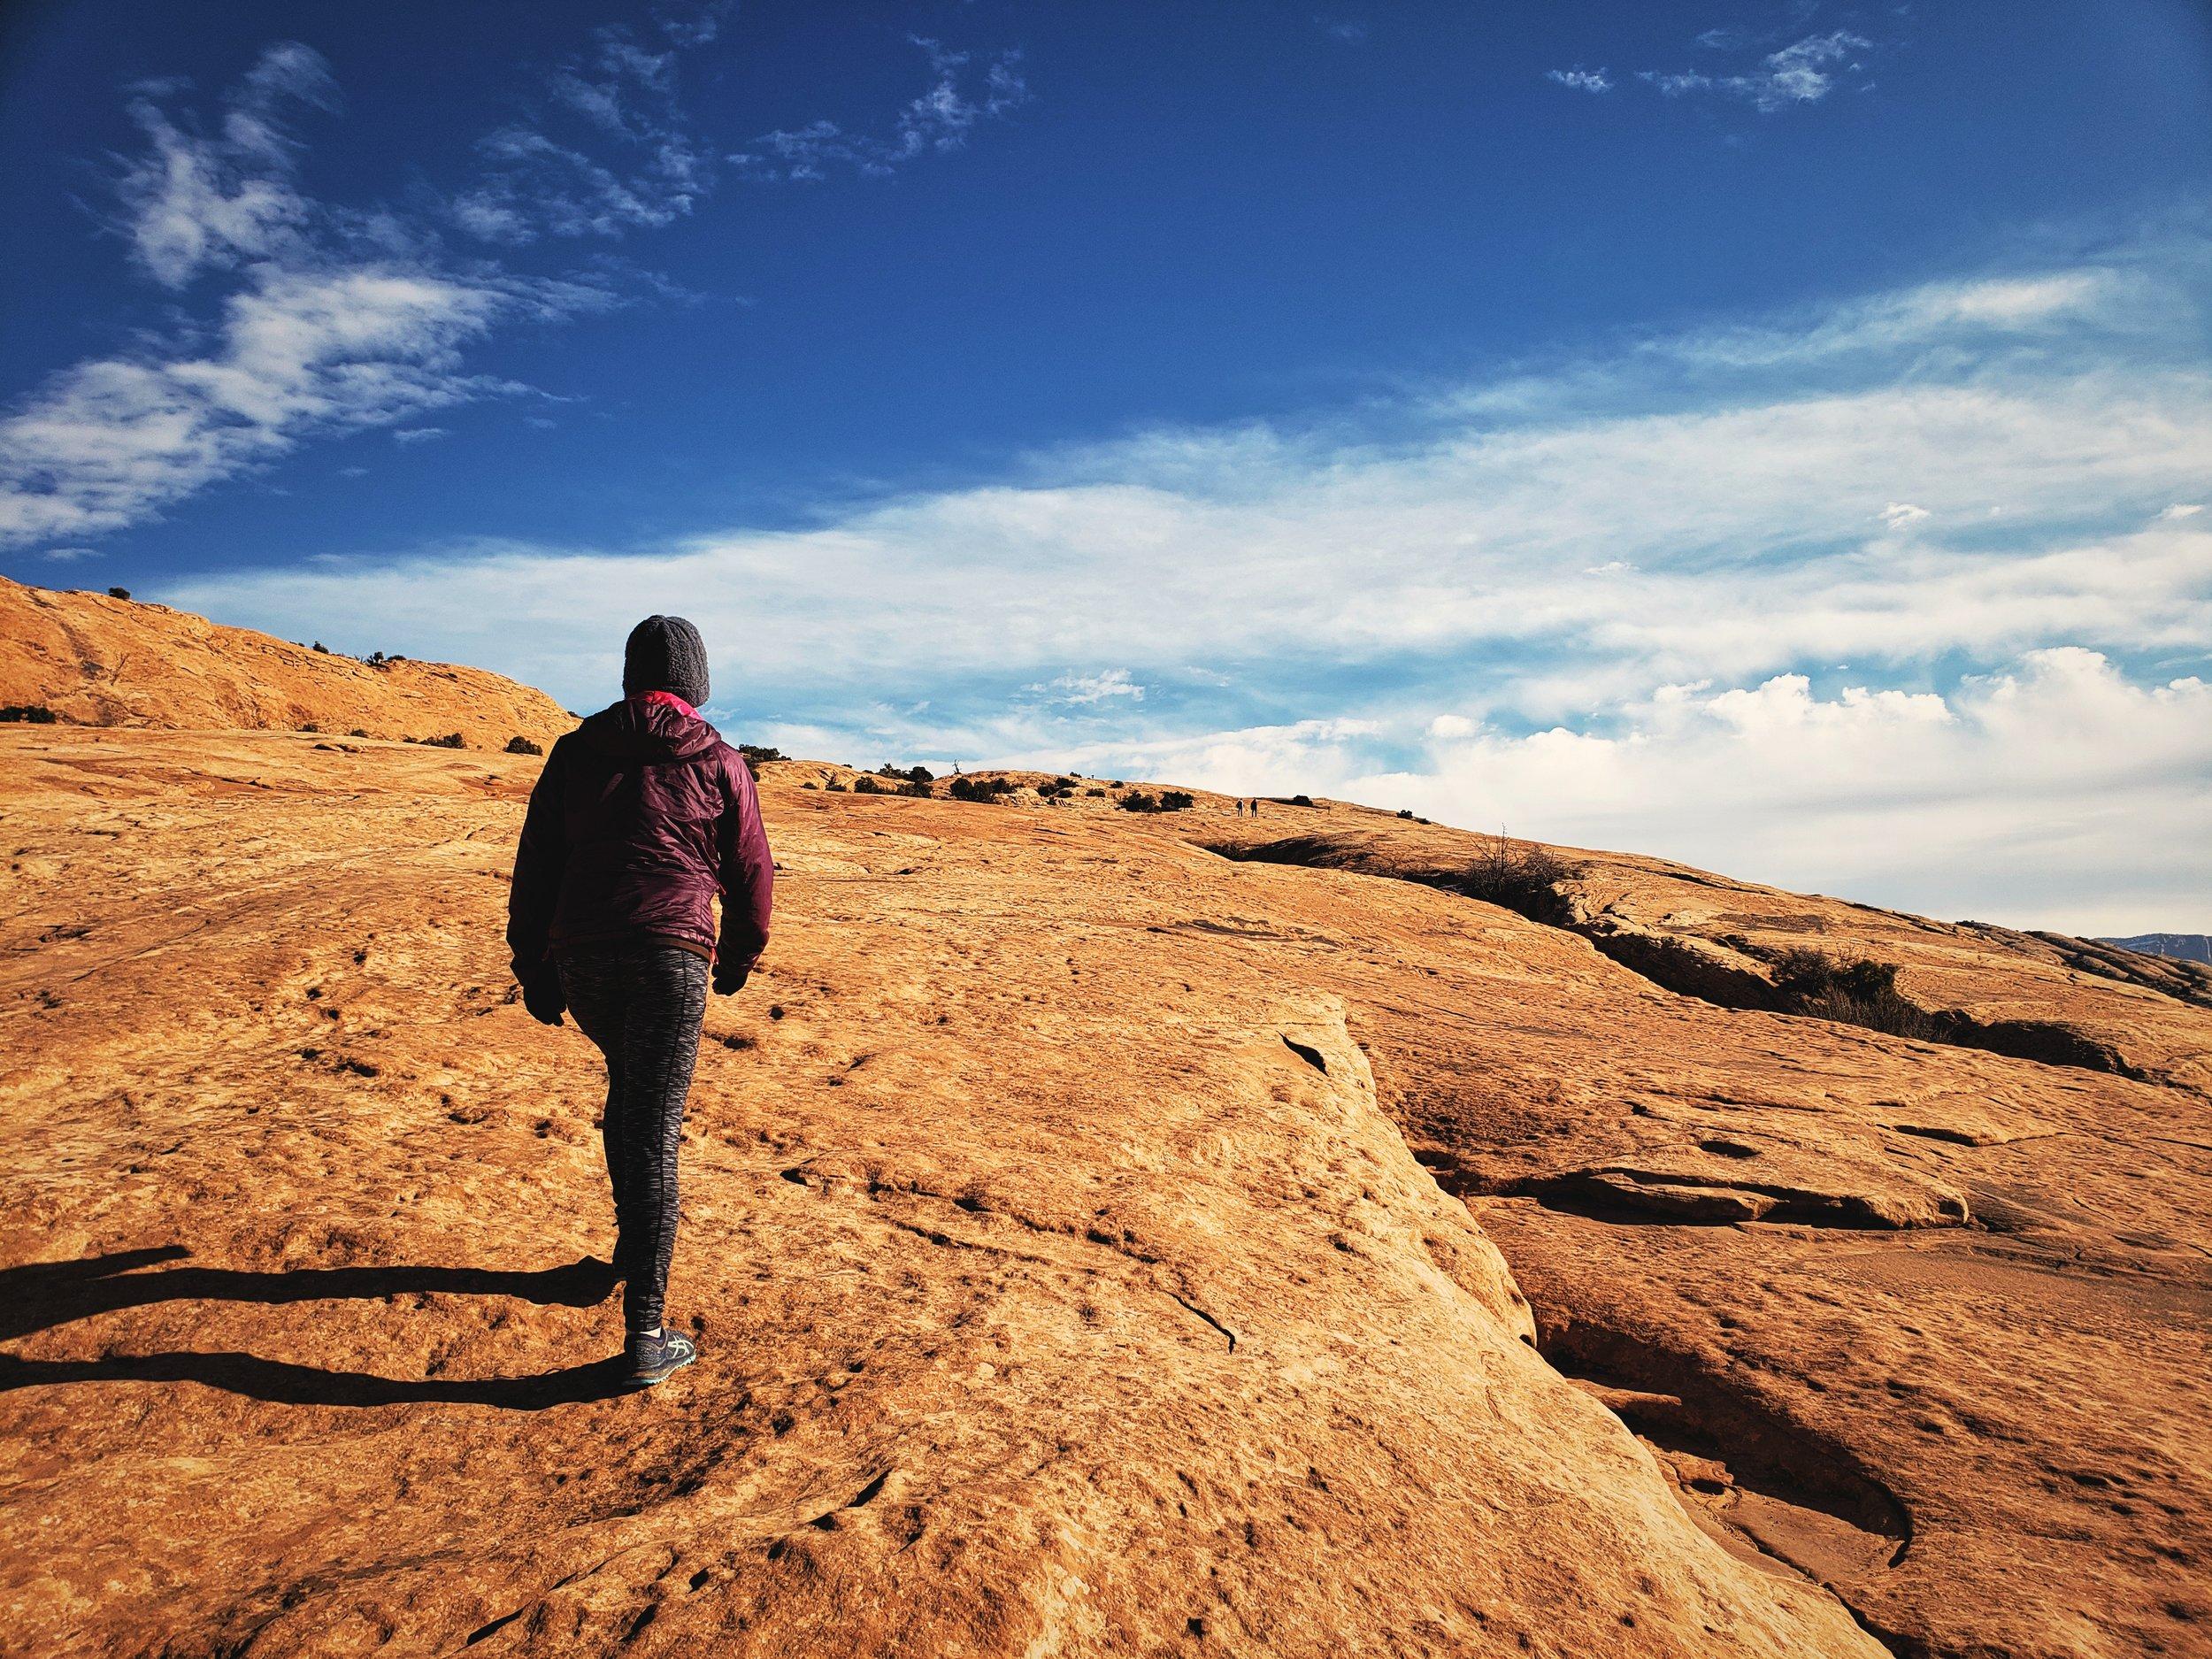 Climbing a massive, open slickrock slope to reach Delicate Arch.